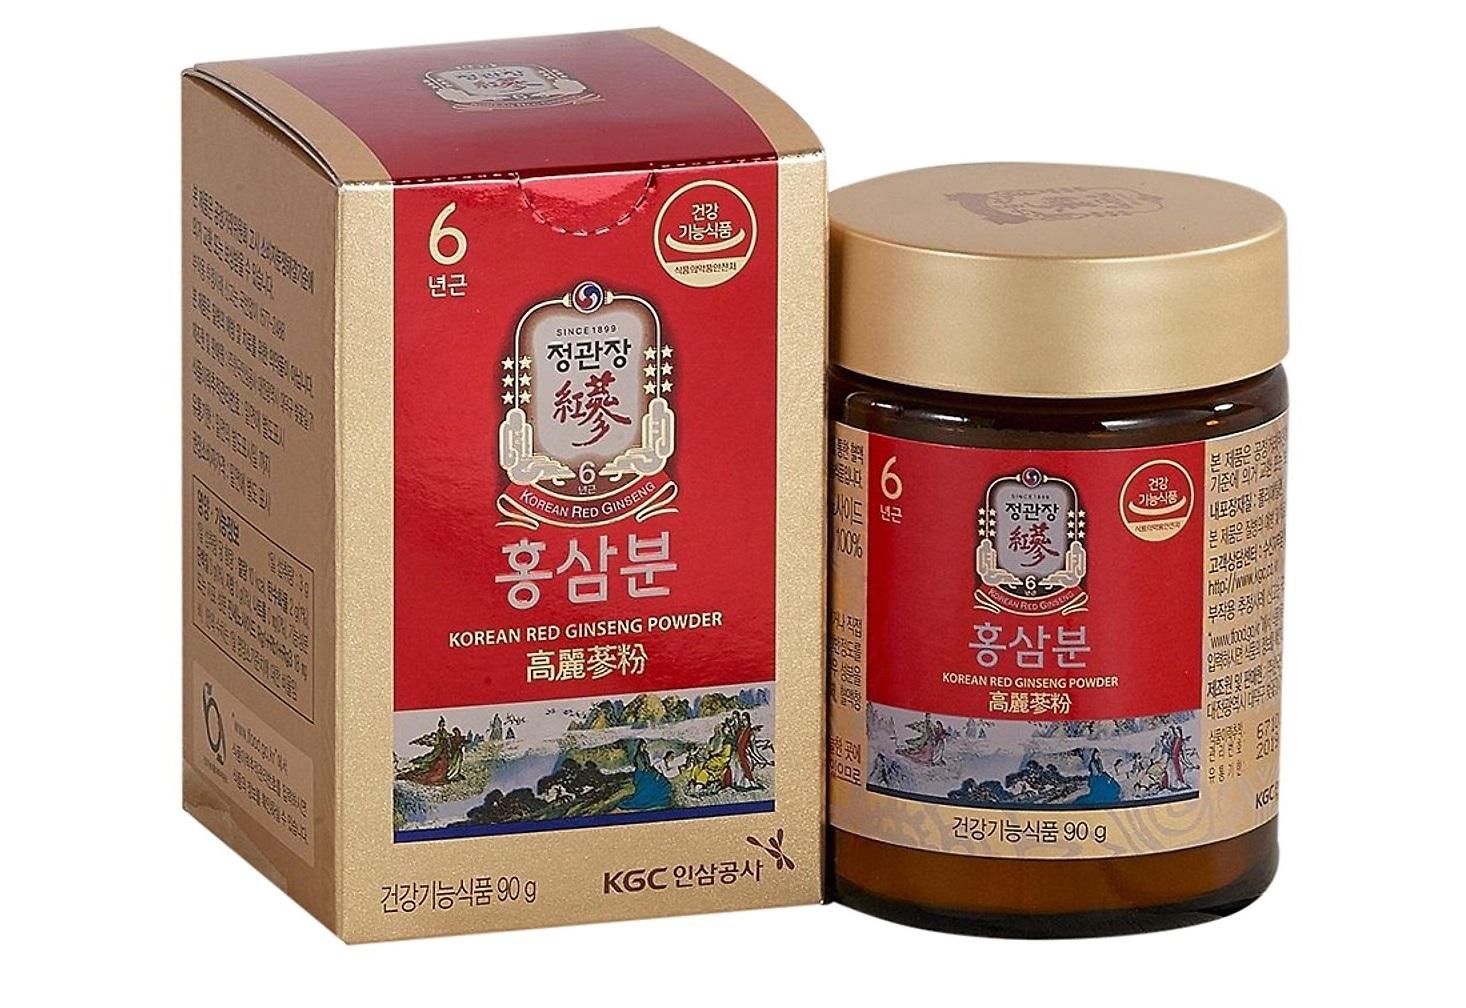 bột hồng sâm kgc cheong kwan jang